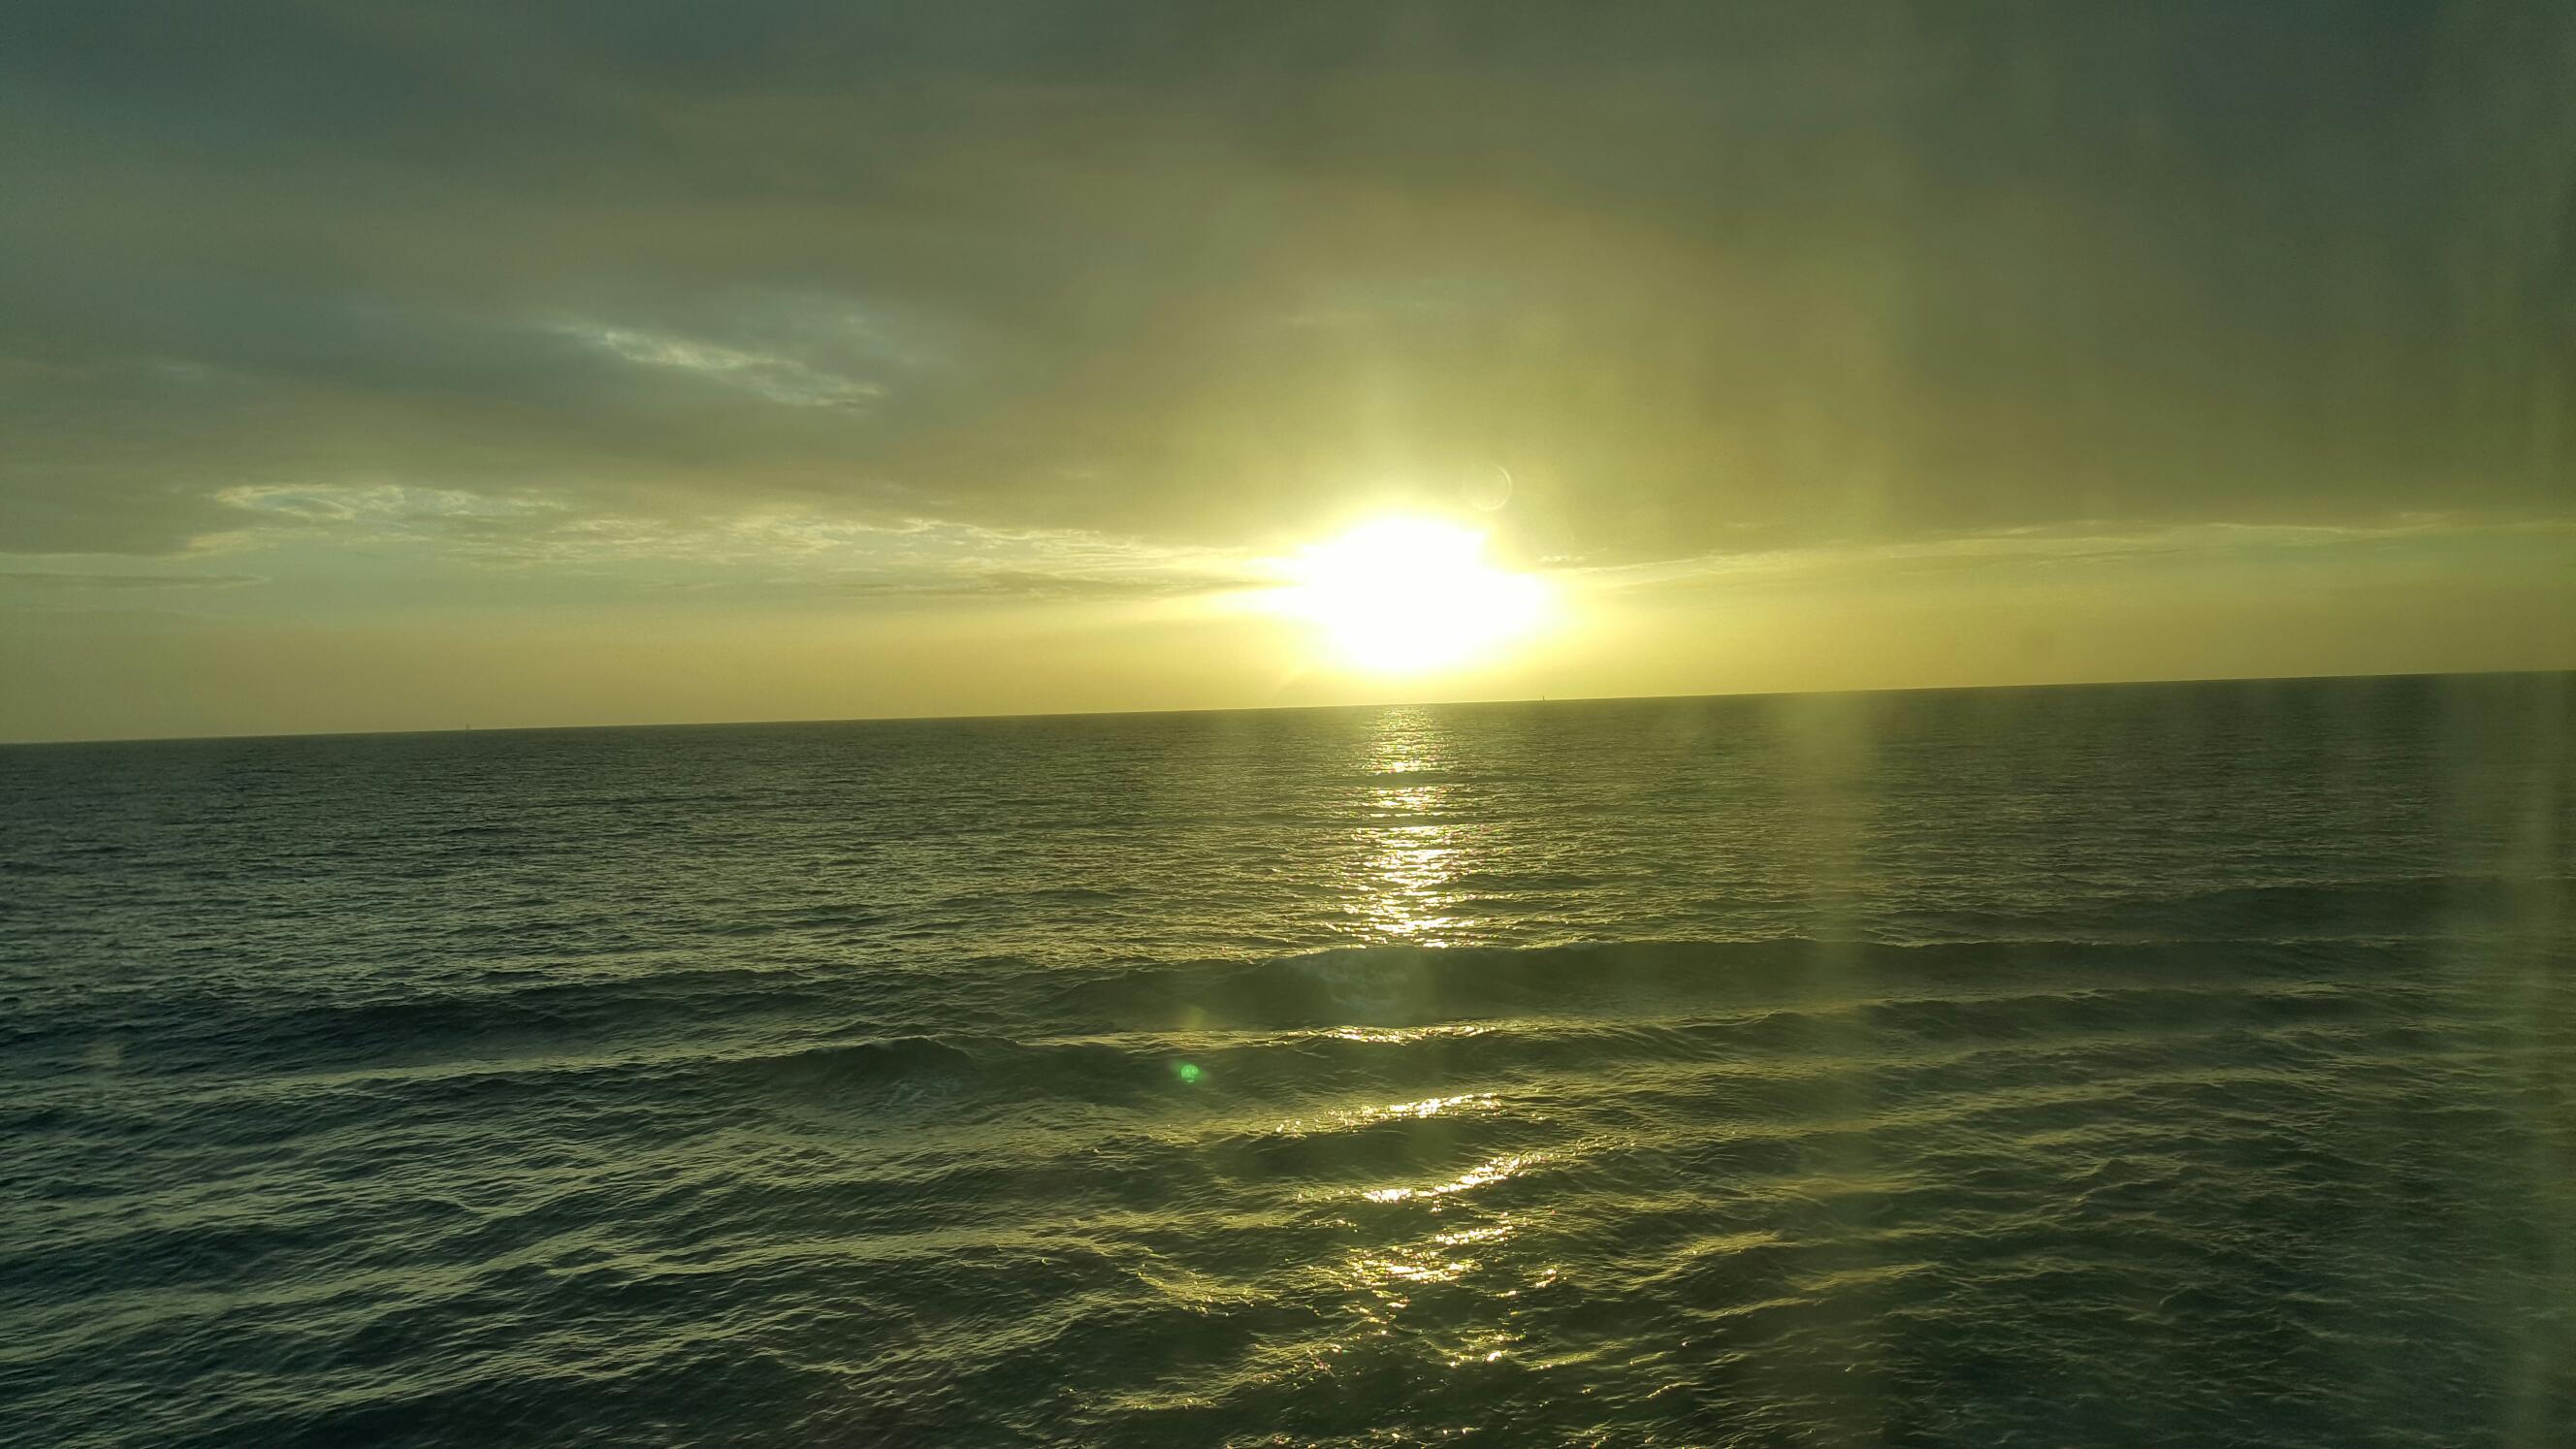 Serenade of the Seas Professional Photo